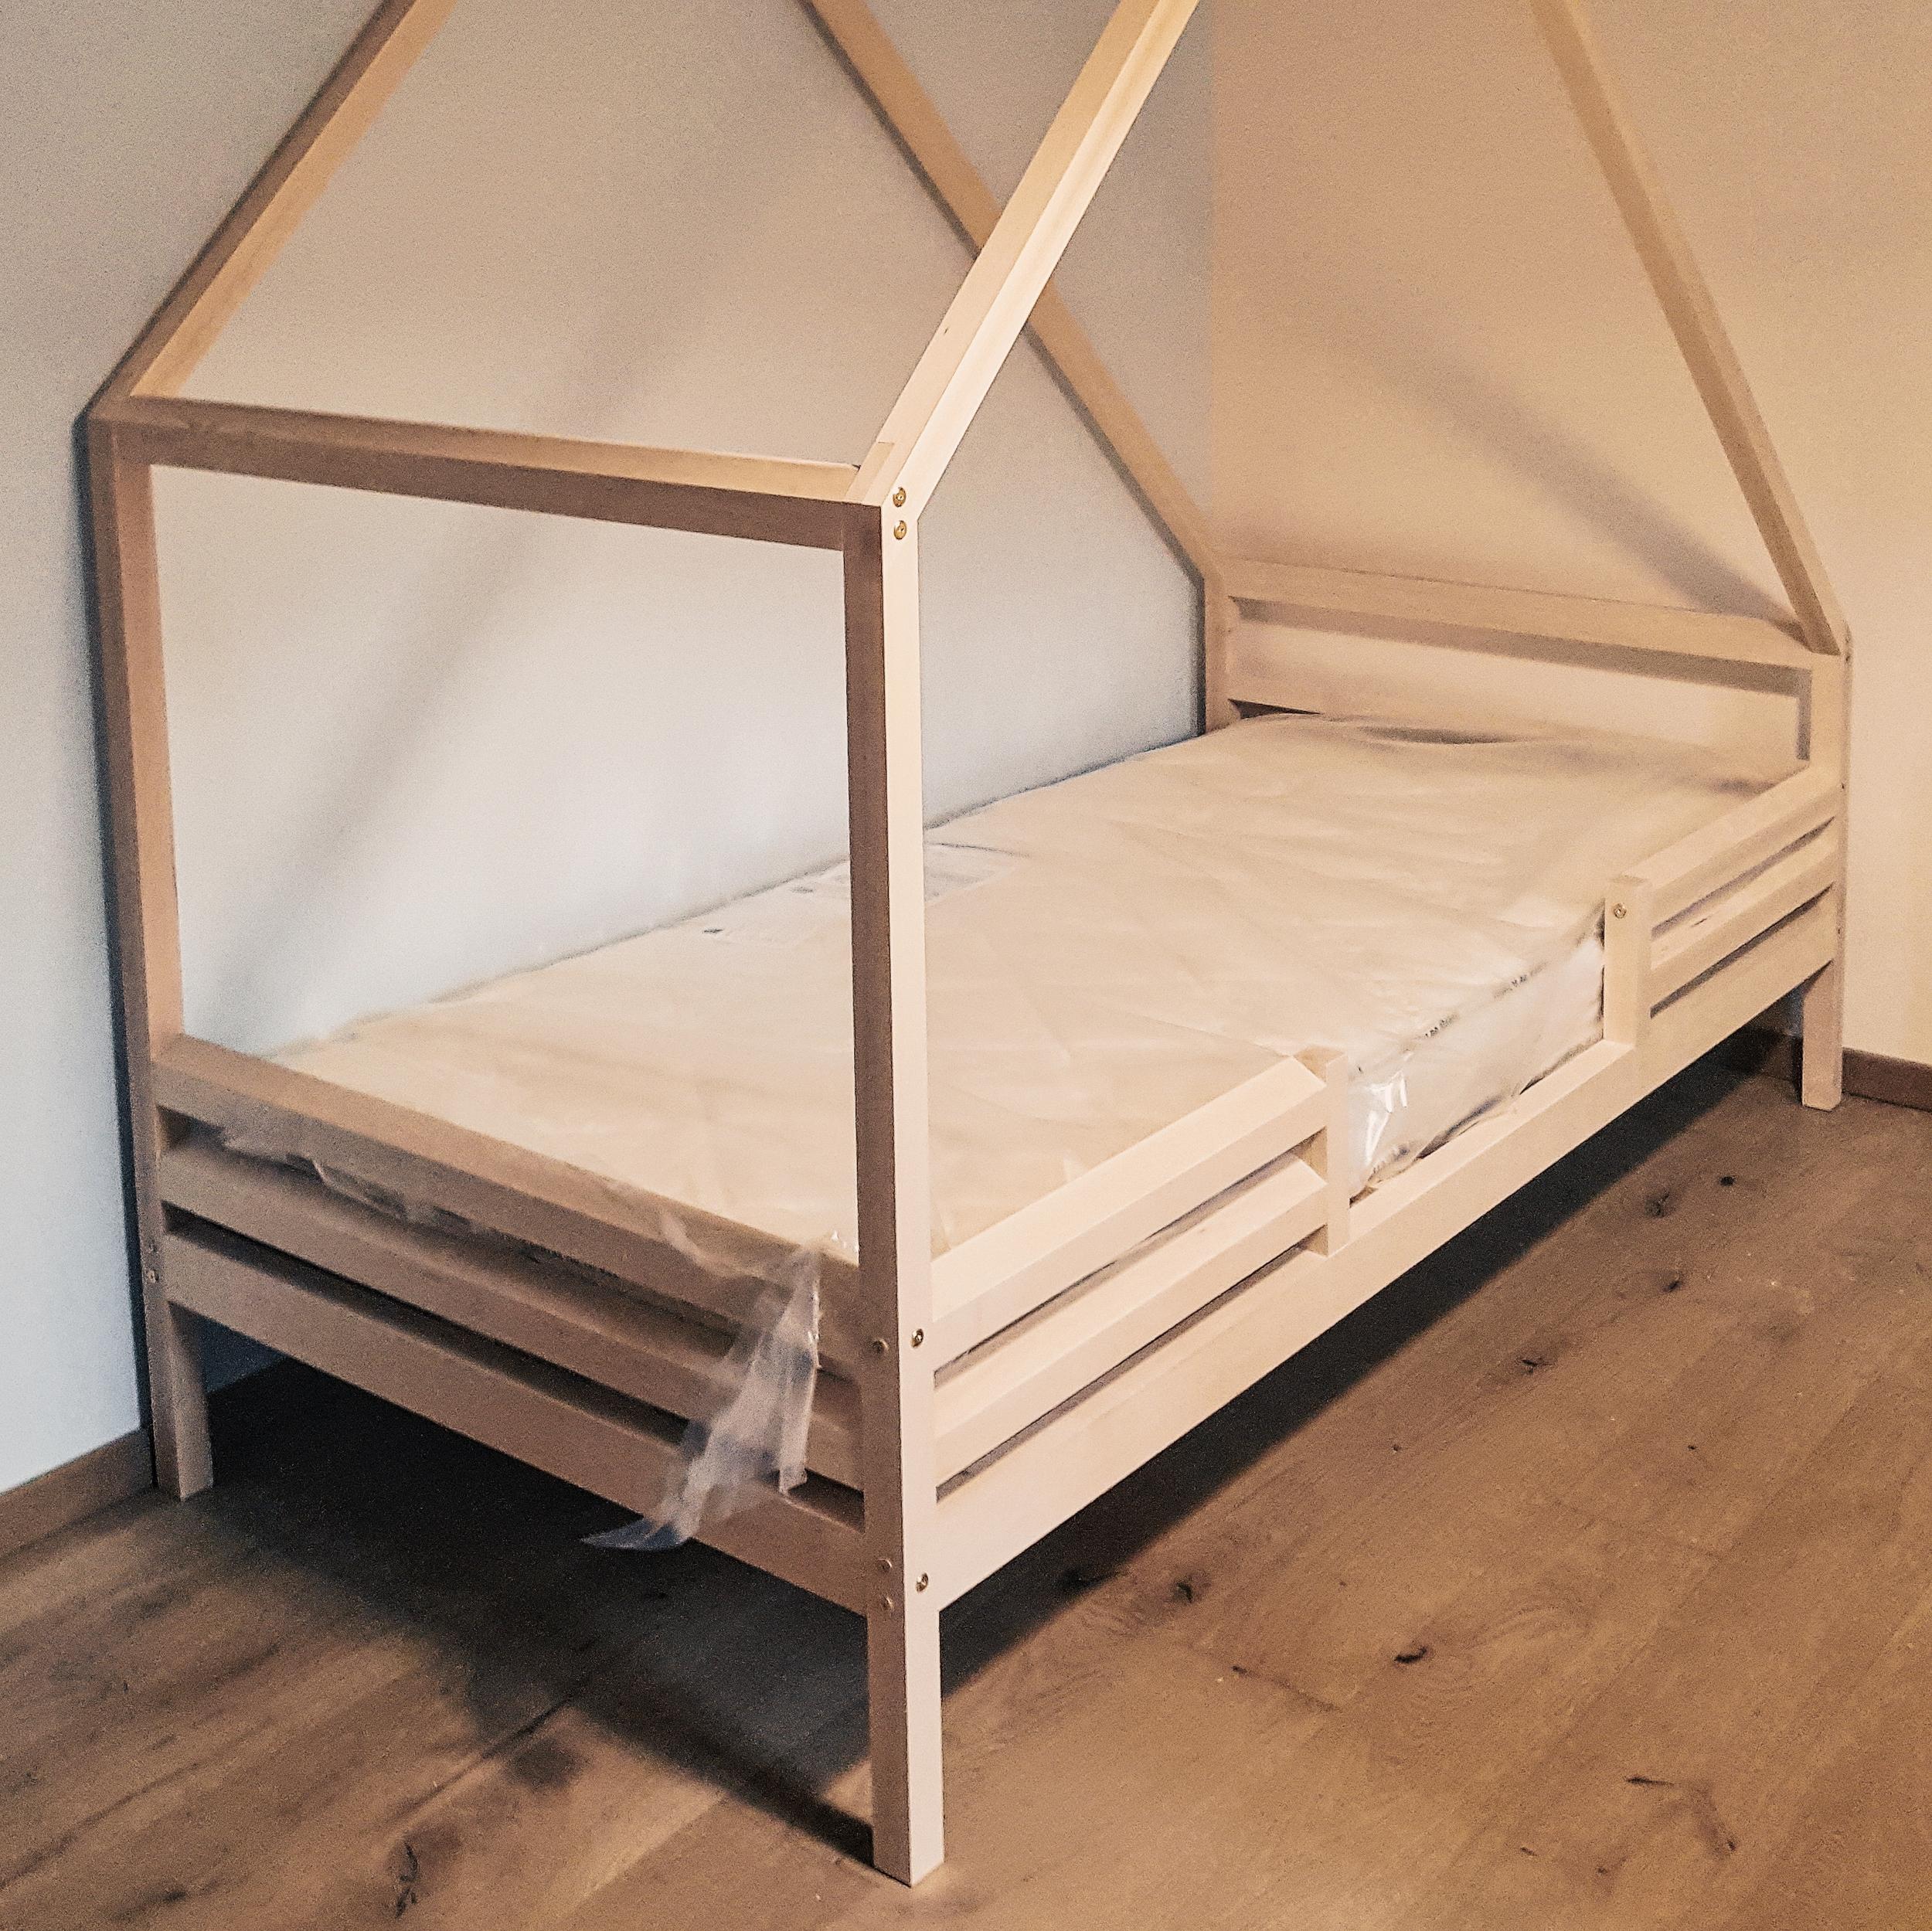 Lit Bebe Cabane Evolutif lit cabane lintukoto 90x190 (avec barrières)